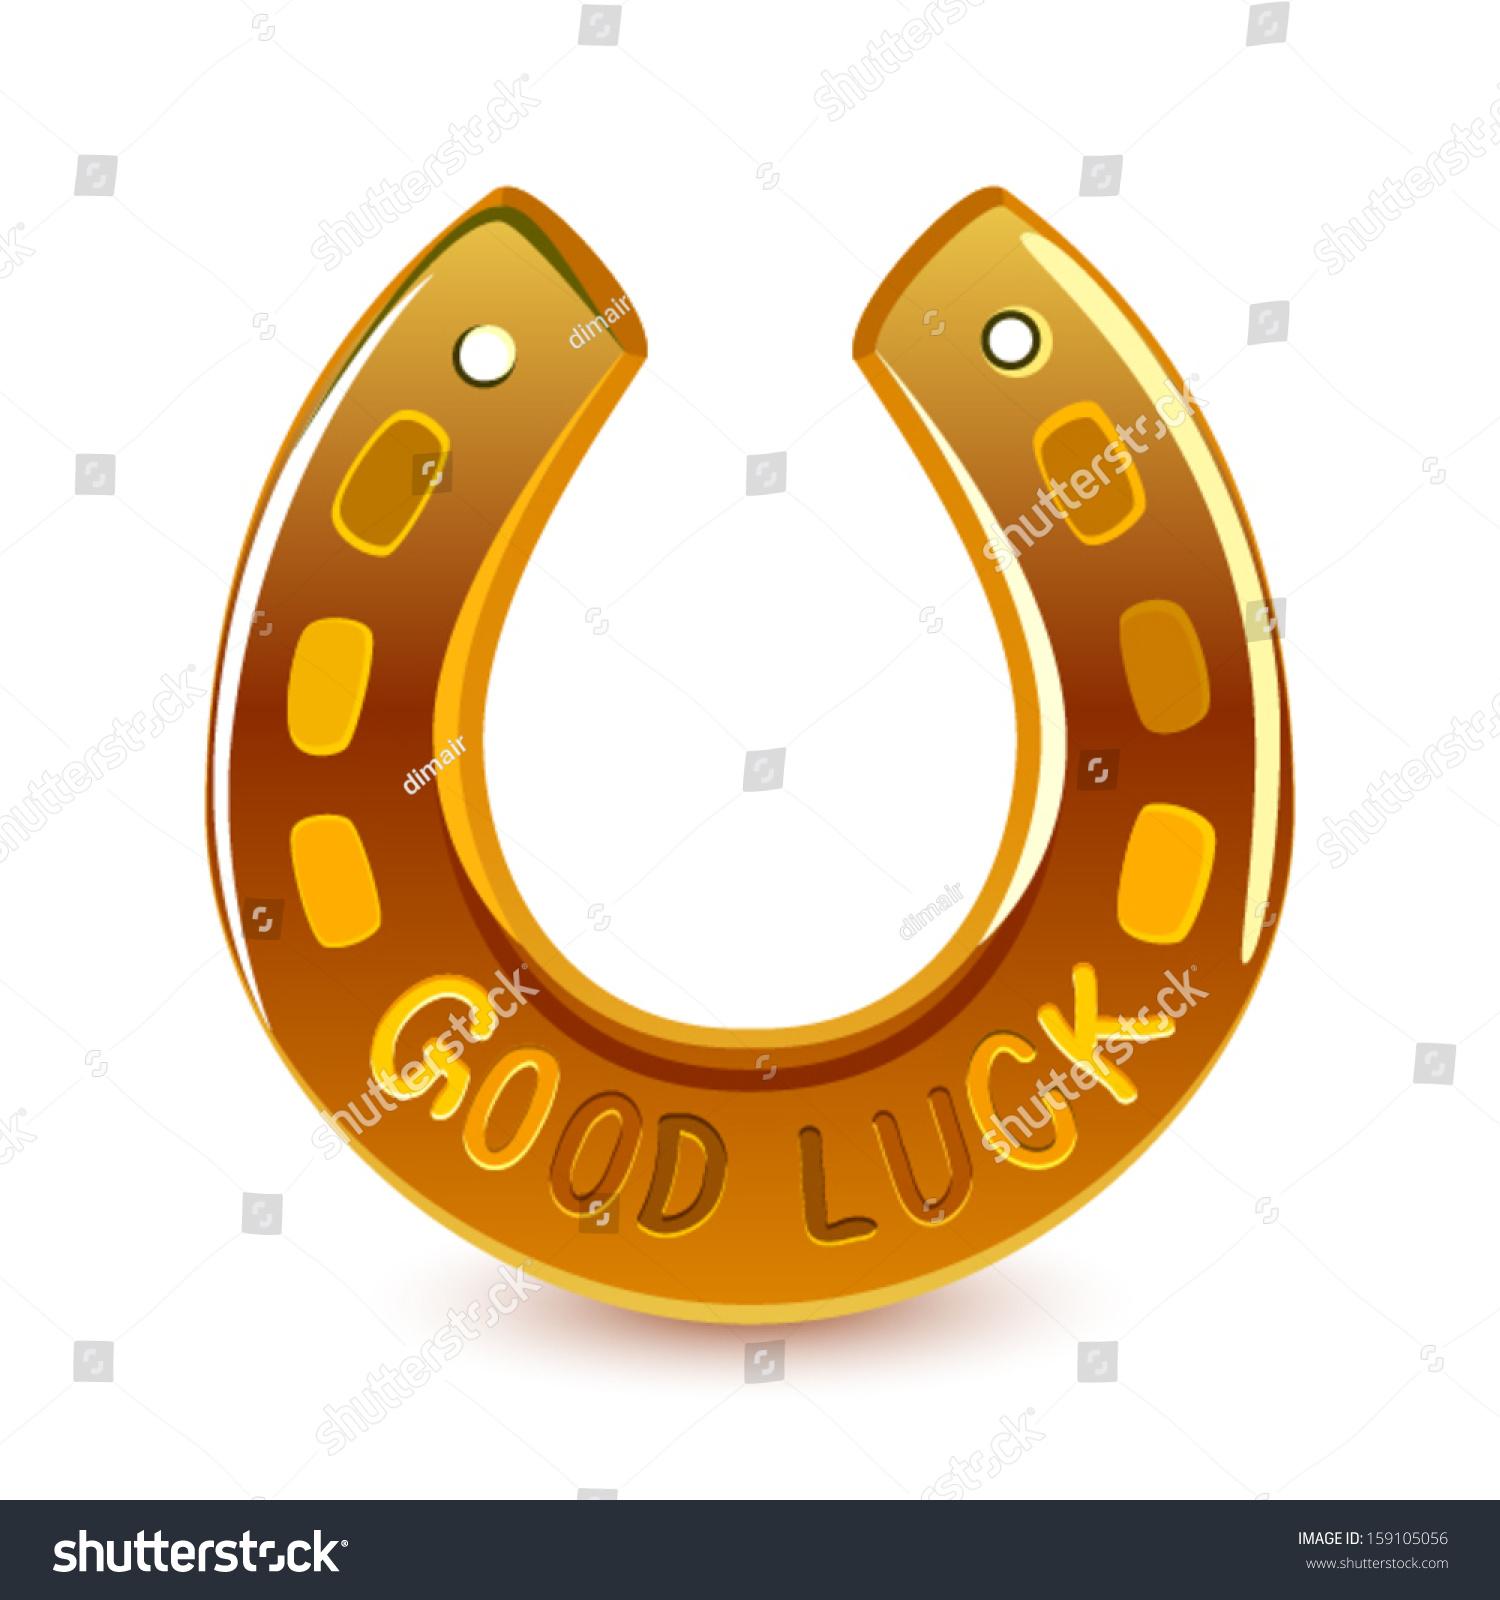 Gold horseshoe good luck vector stock vector 159105056 shutterstock gold horseshoe good luck vector biocorpaavc Choice Image